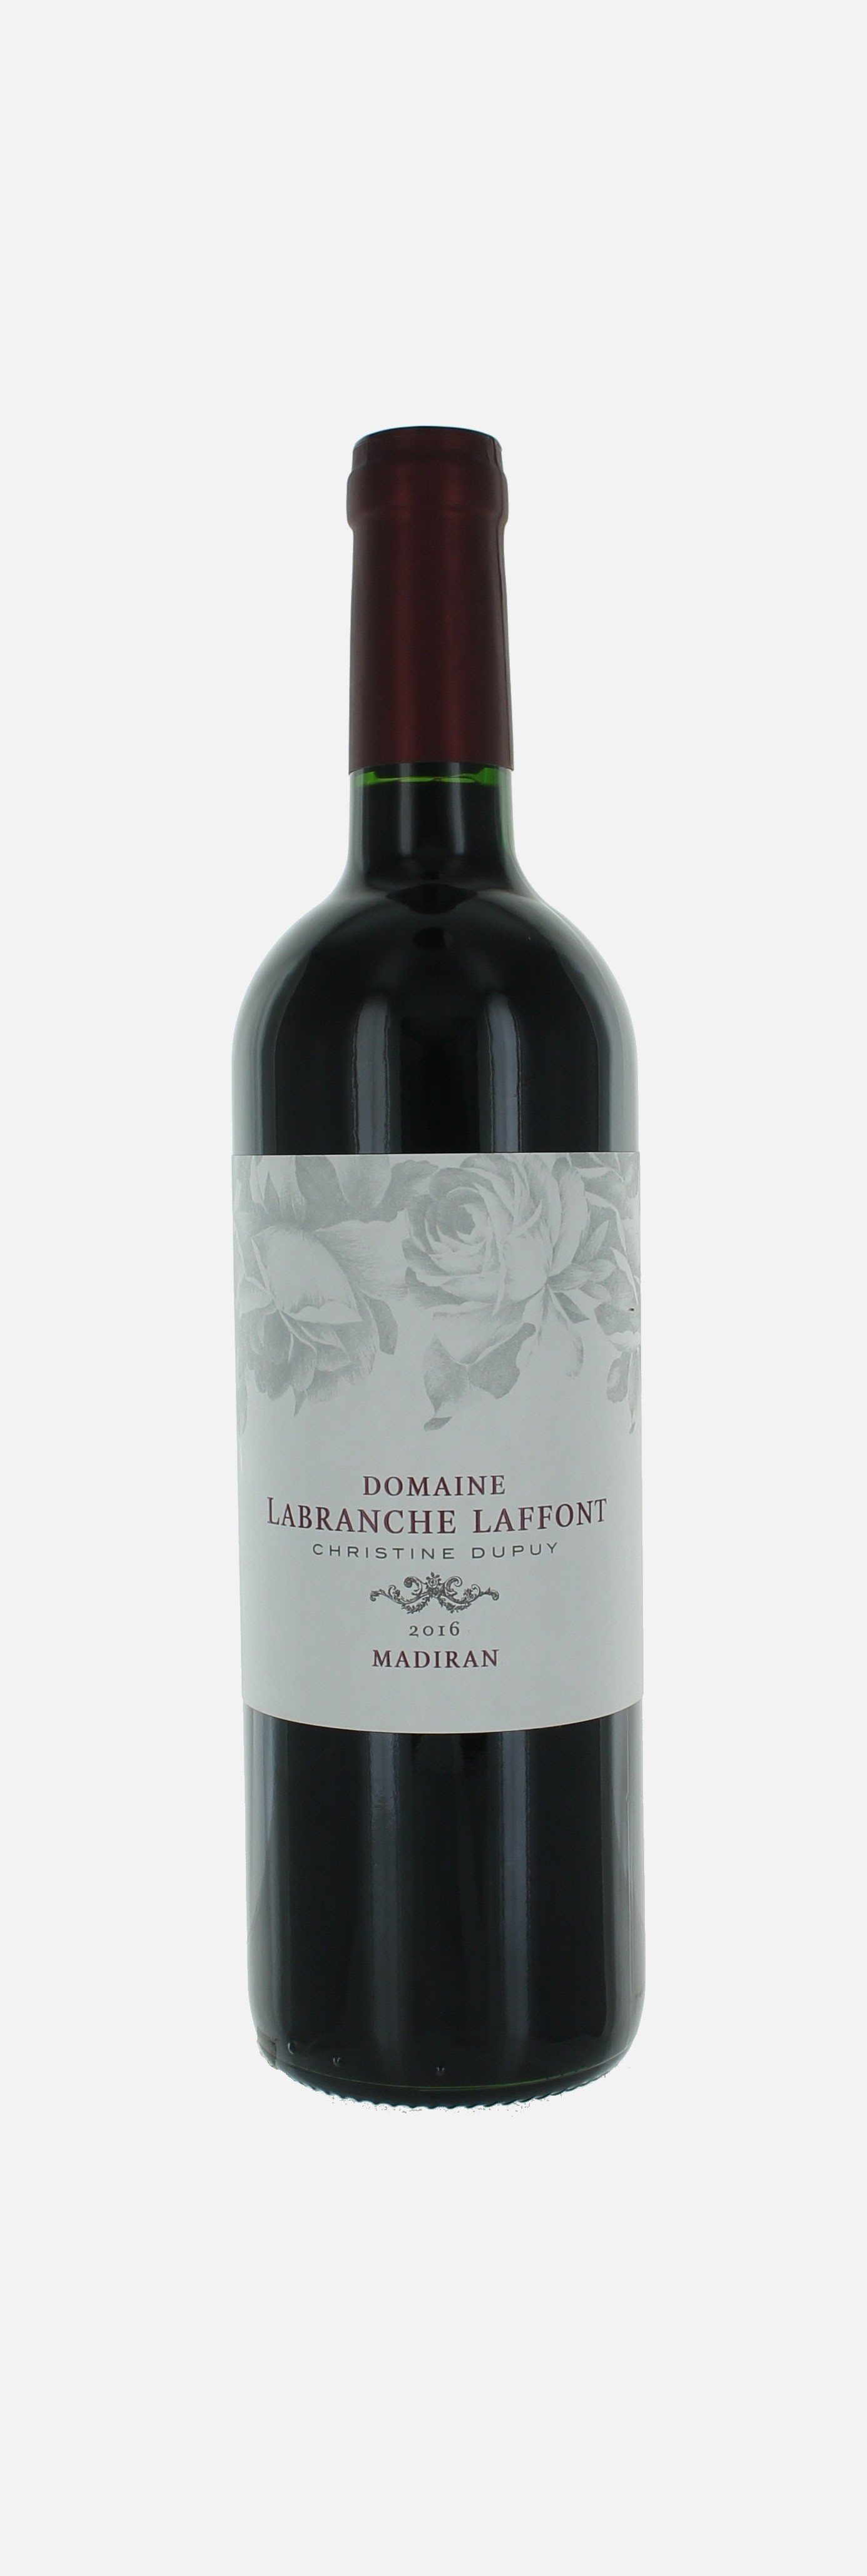 Madiran Tradition, Labranche Laffont